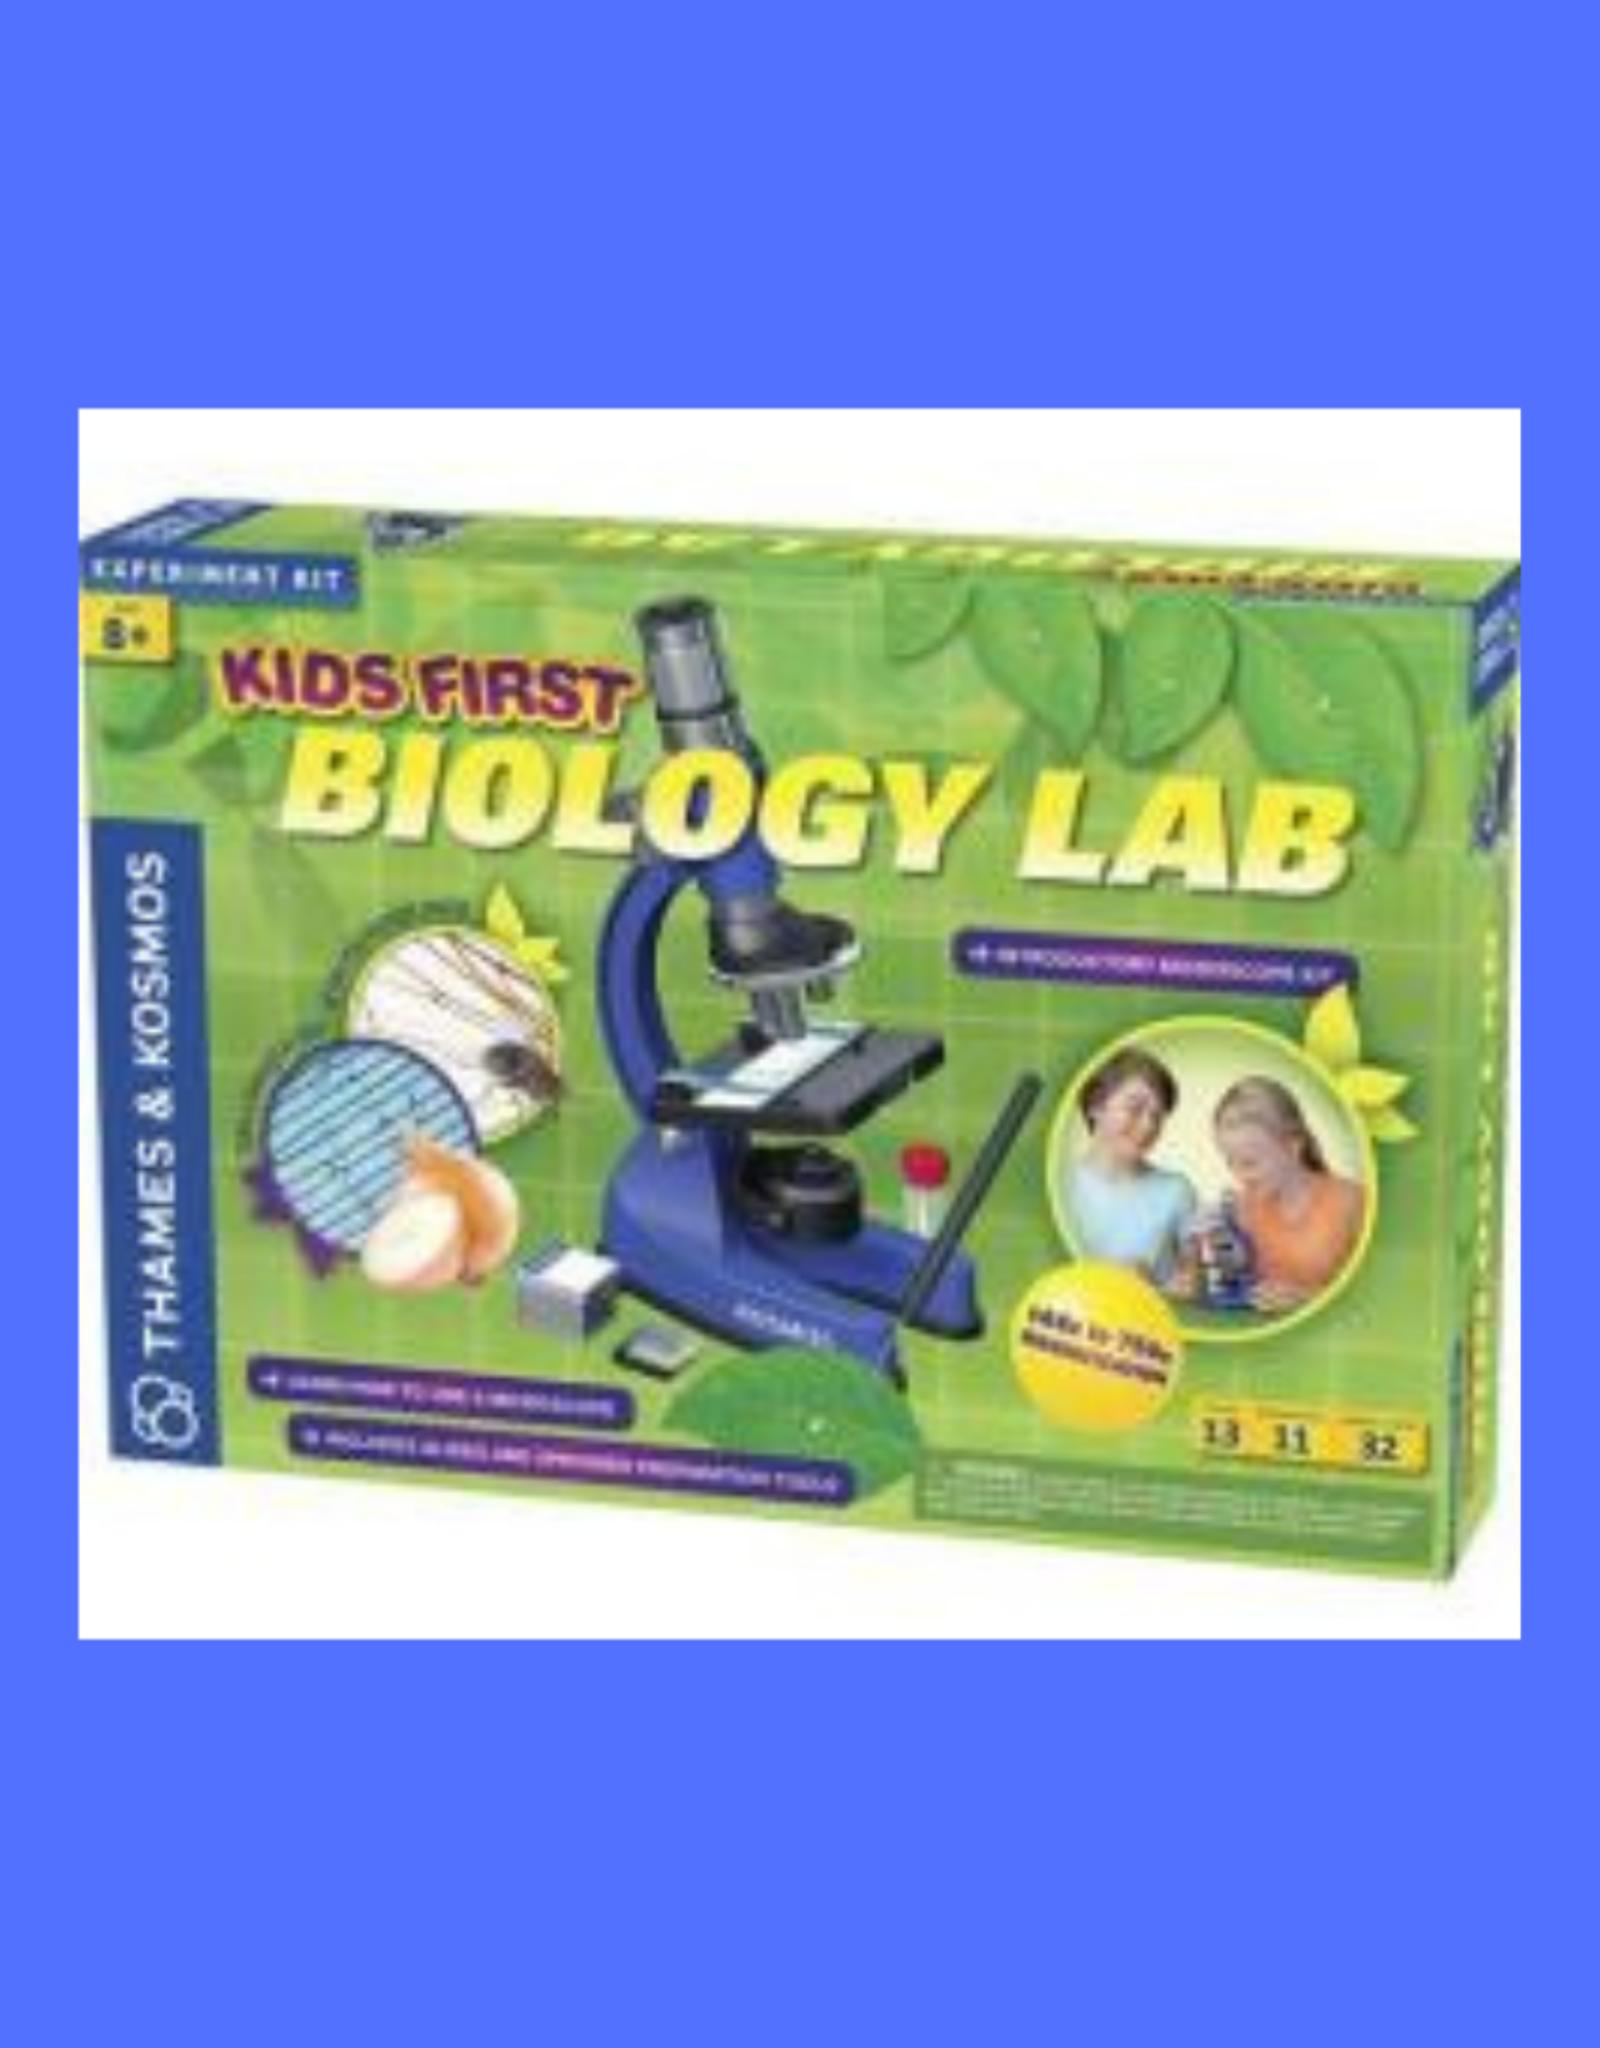 THAMES & KOSMOS Kids First Biology Lab (V 2.0)